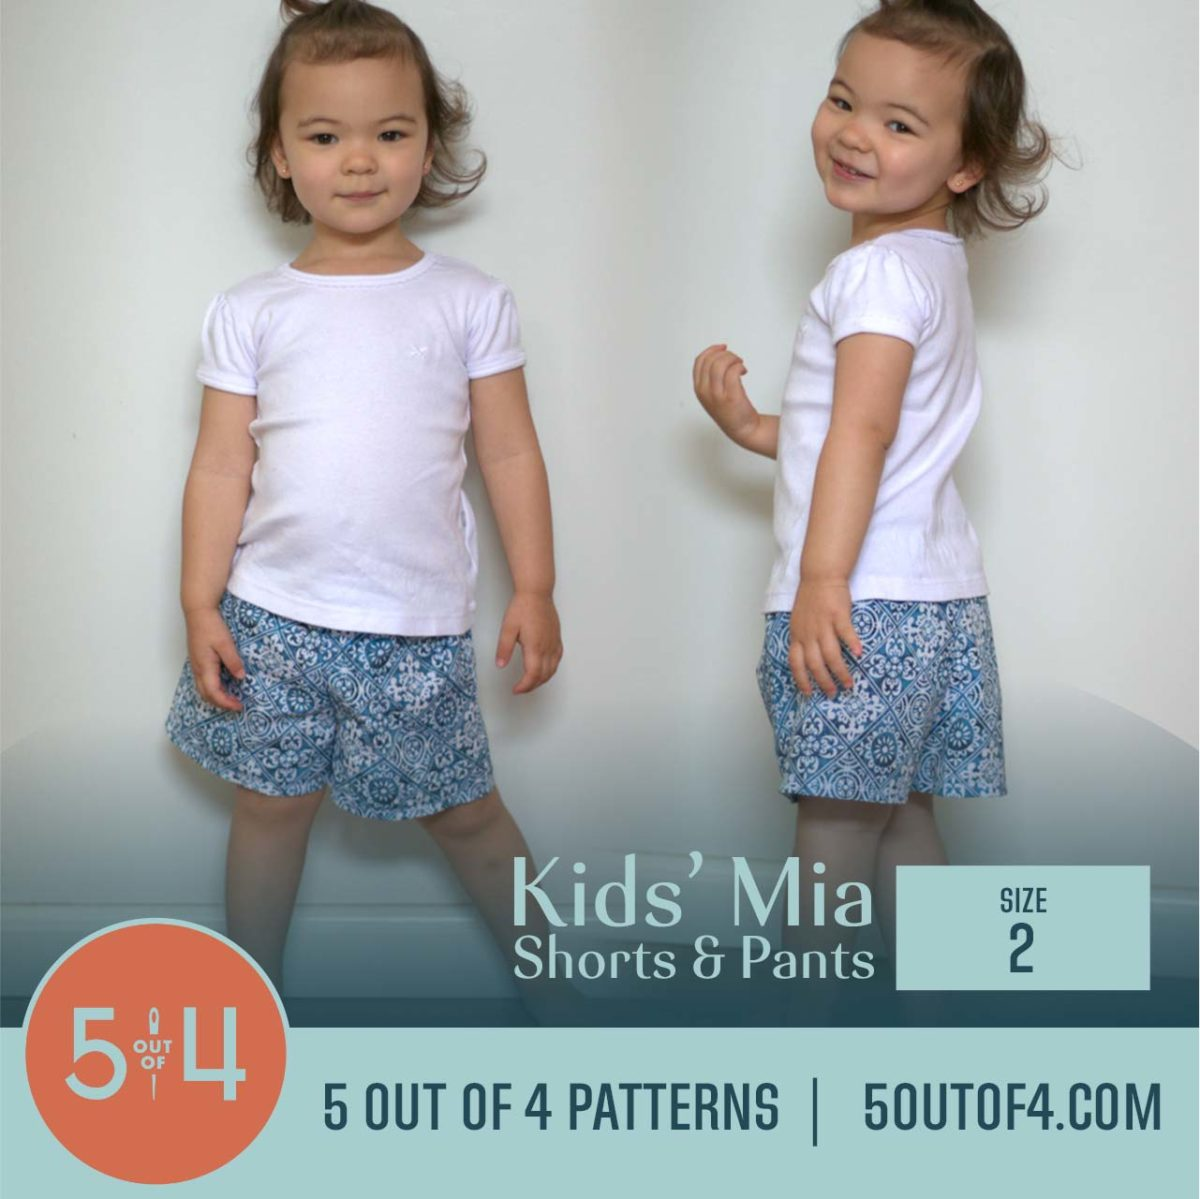 5oo4 Patterns Kids' Mia Pants Size 2